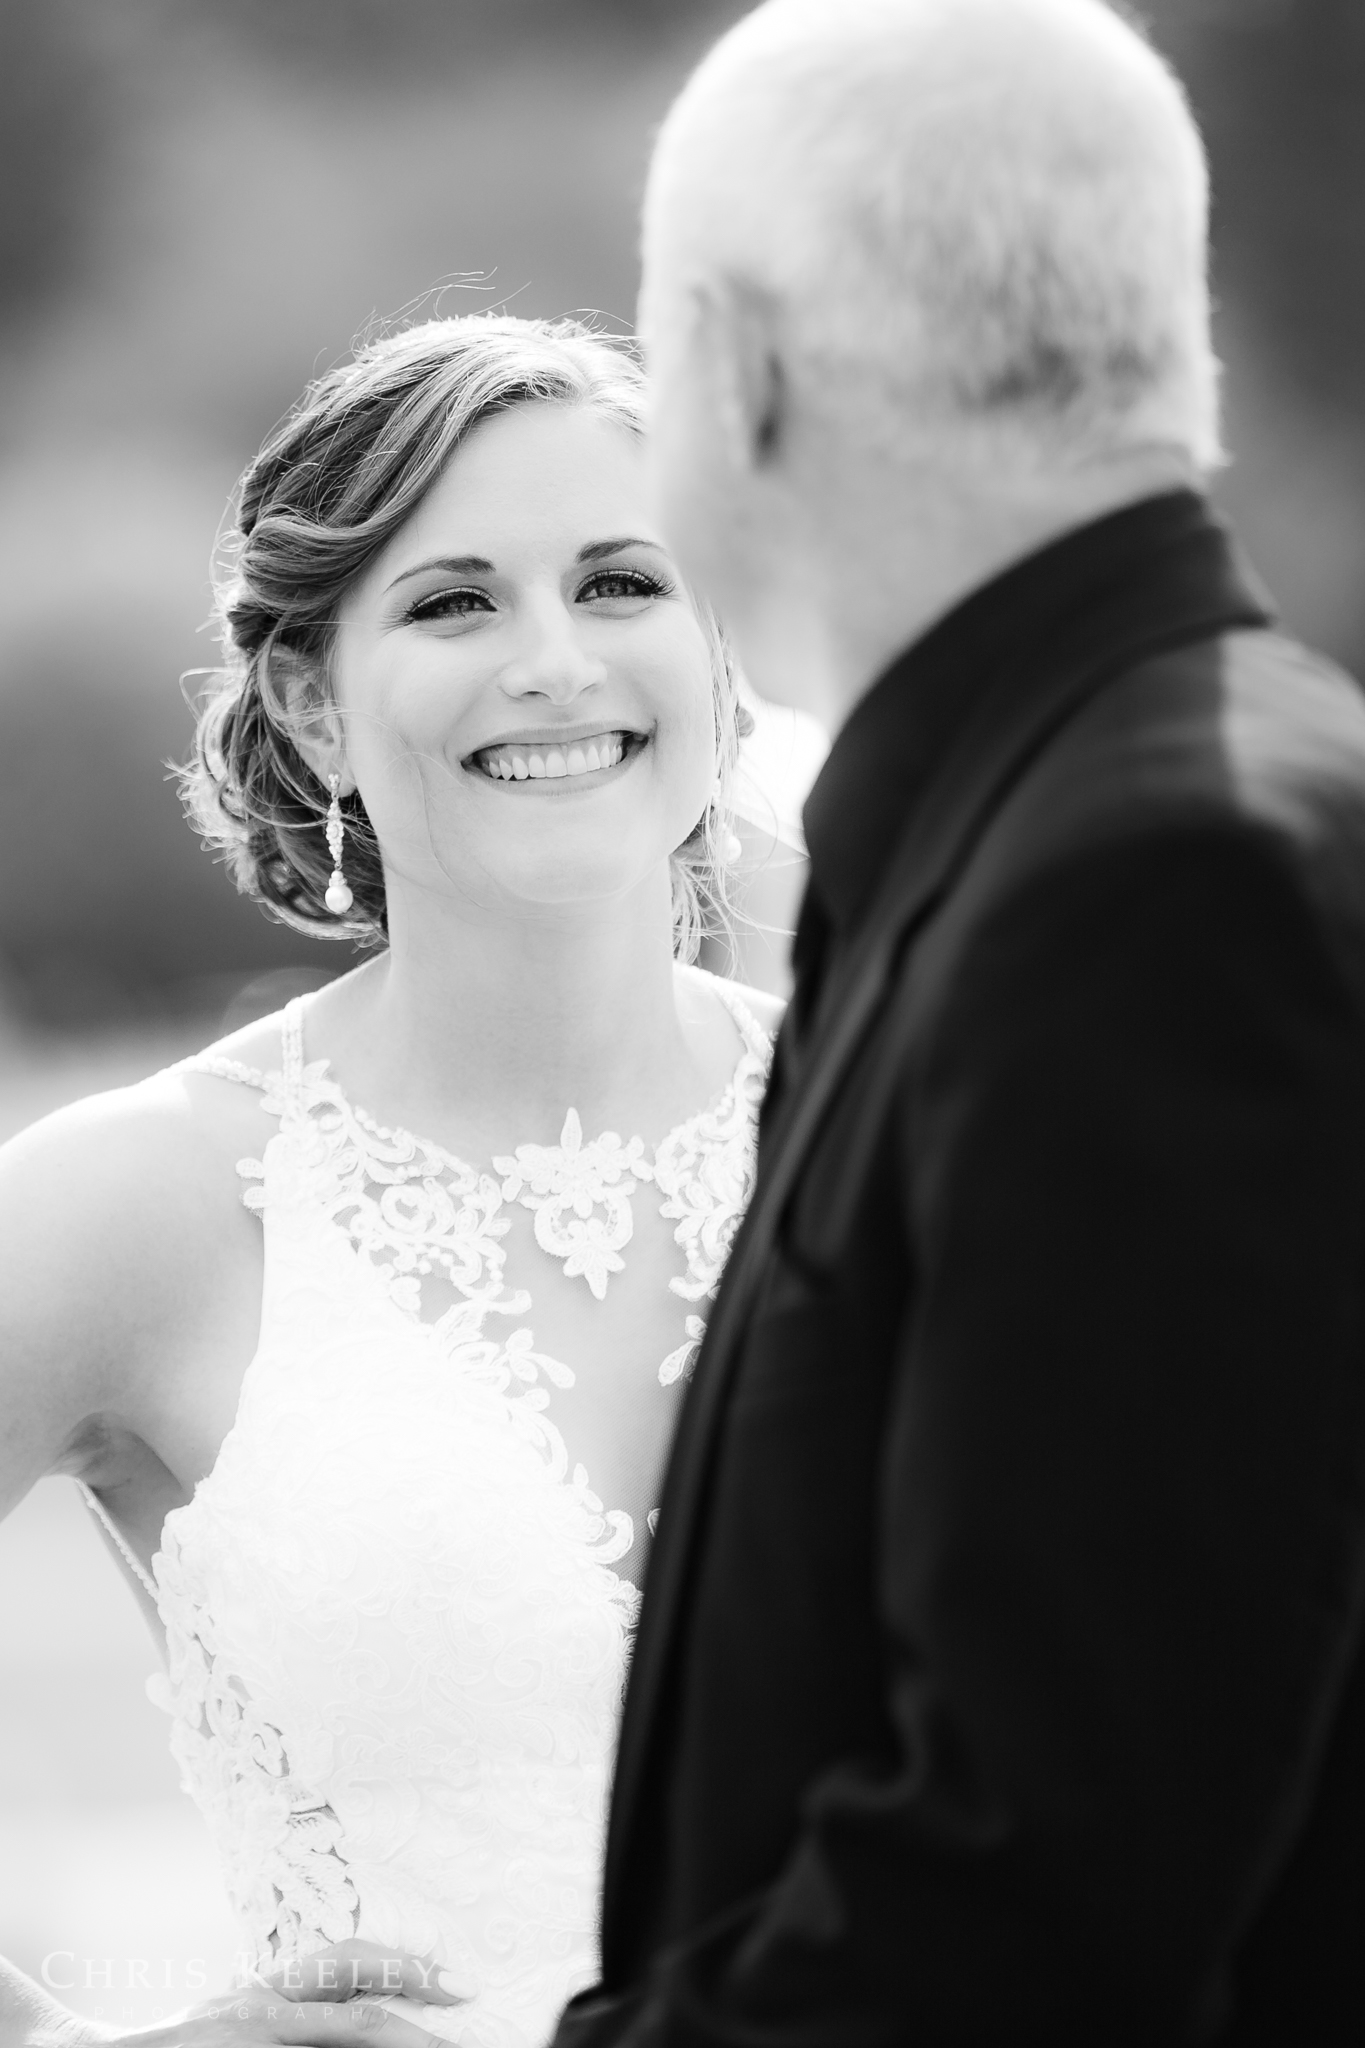 mombo-portsmouth-new-hampshire-wedding-photograper-25.jpg